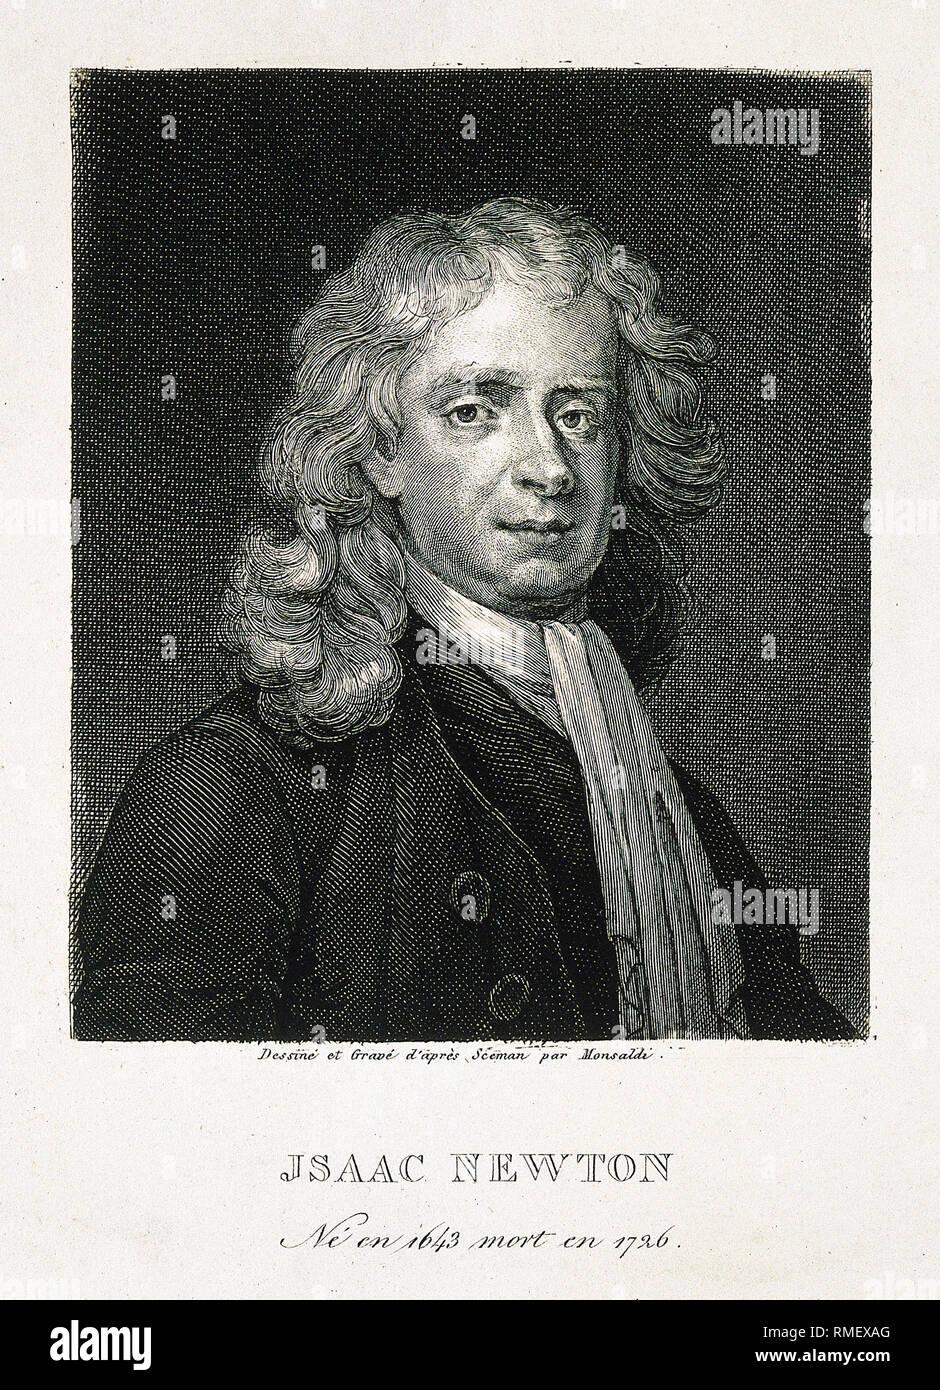 Sir Isaac Newton, line engraving by A. M. Monsaldi after E. Seeman, 1726, portrait, print - Stock Image